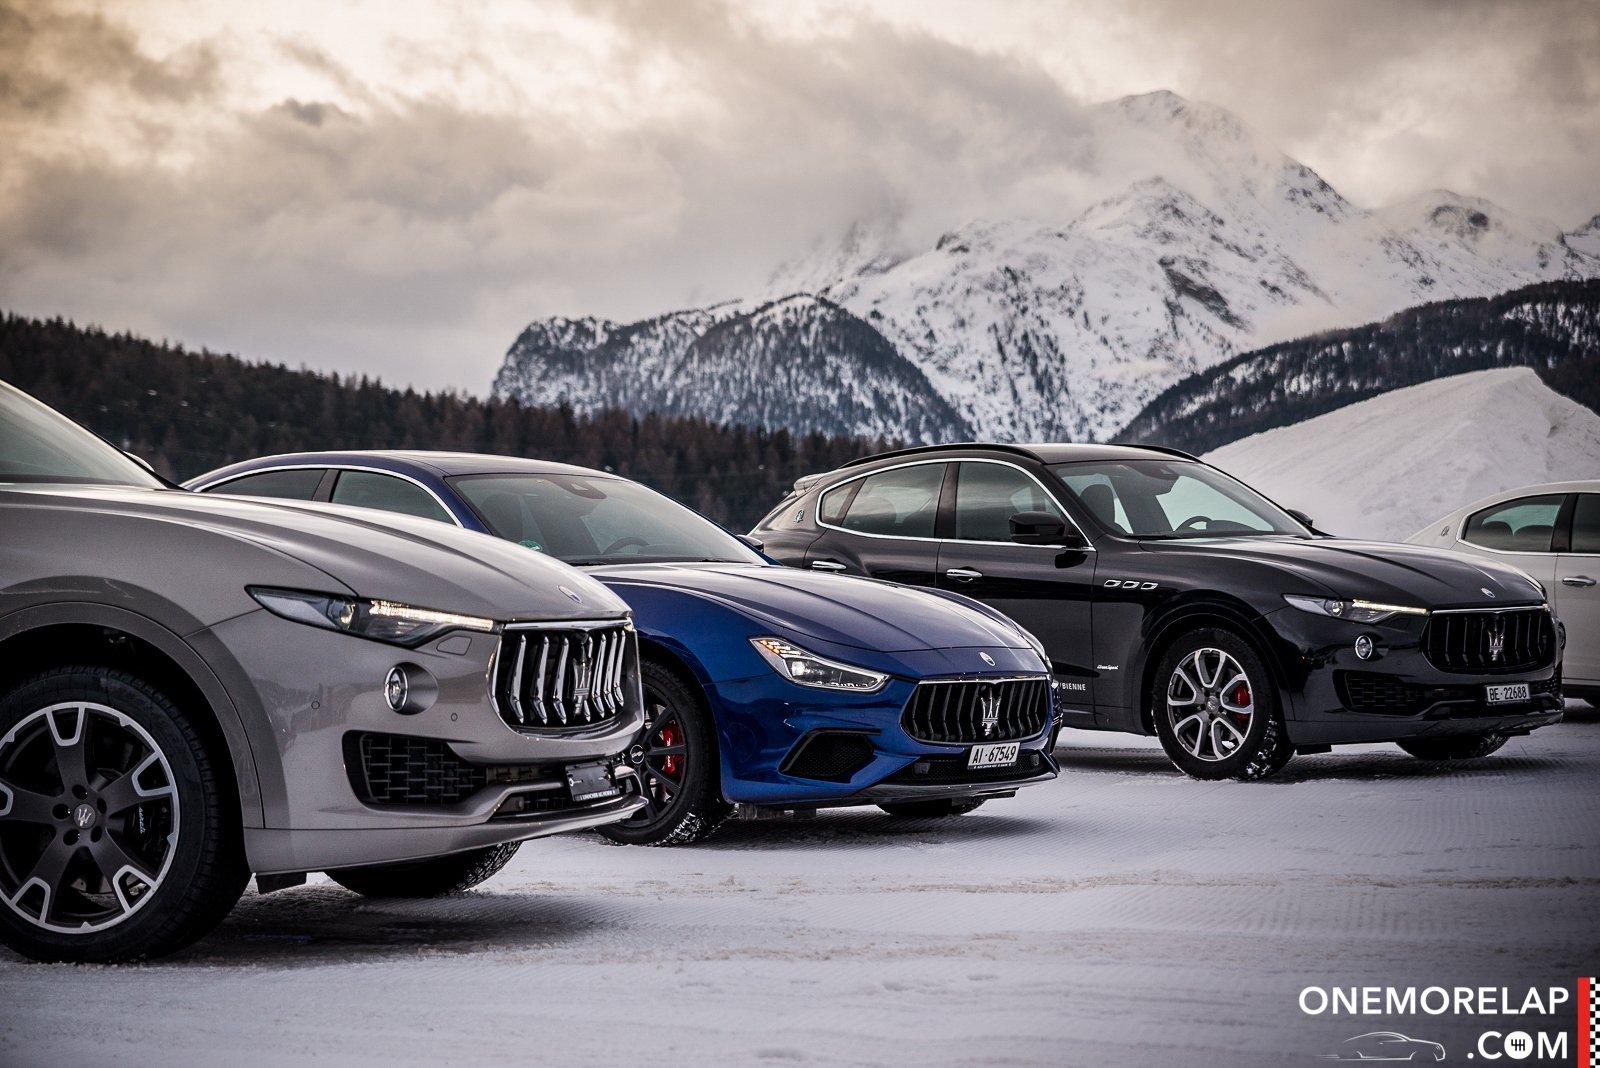 Mit Maserati beim SnowPolo St. Moritz 2018